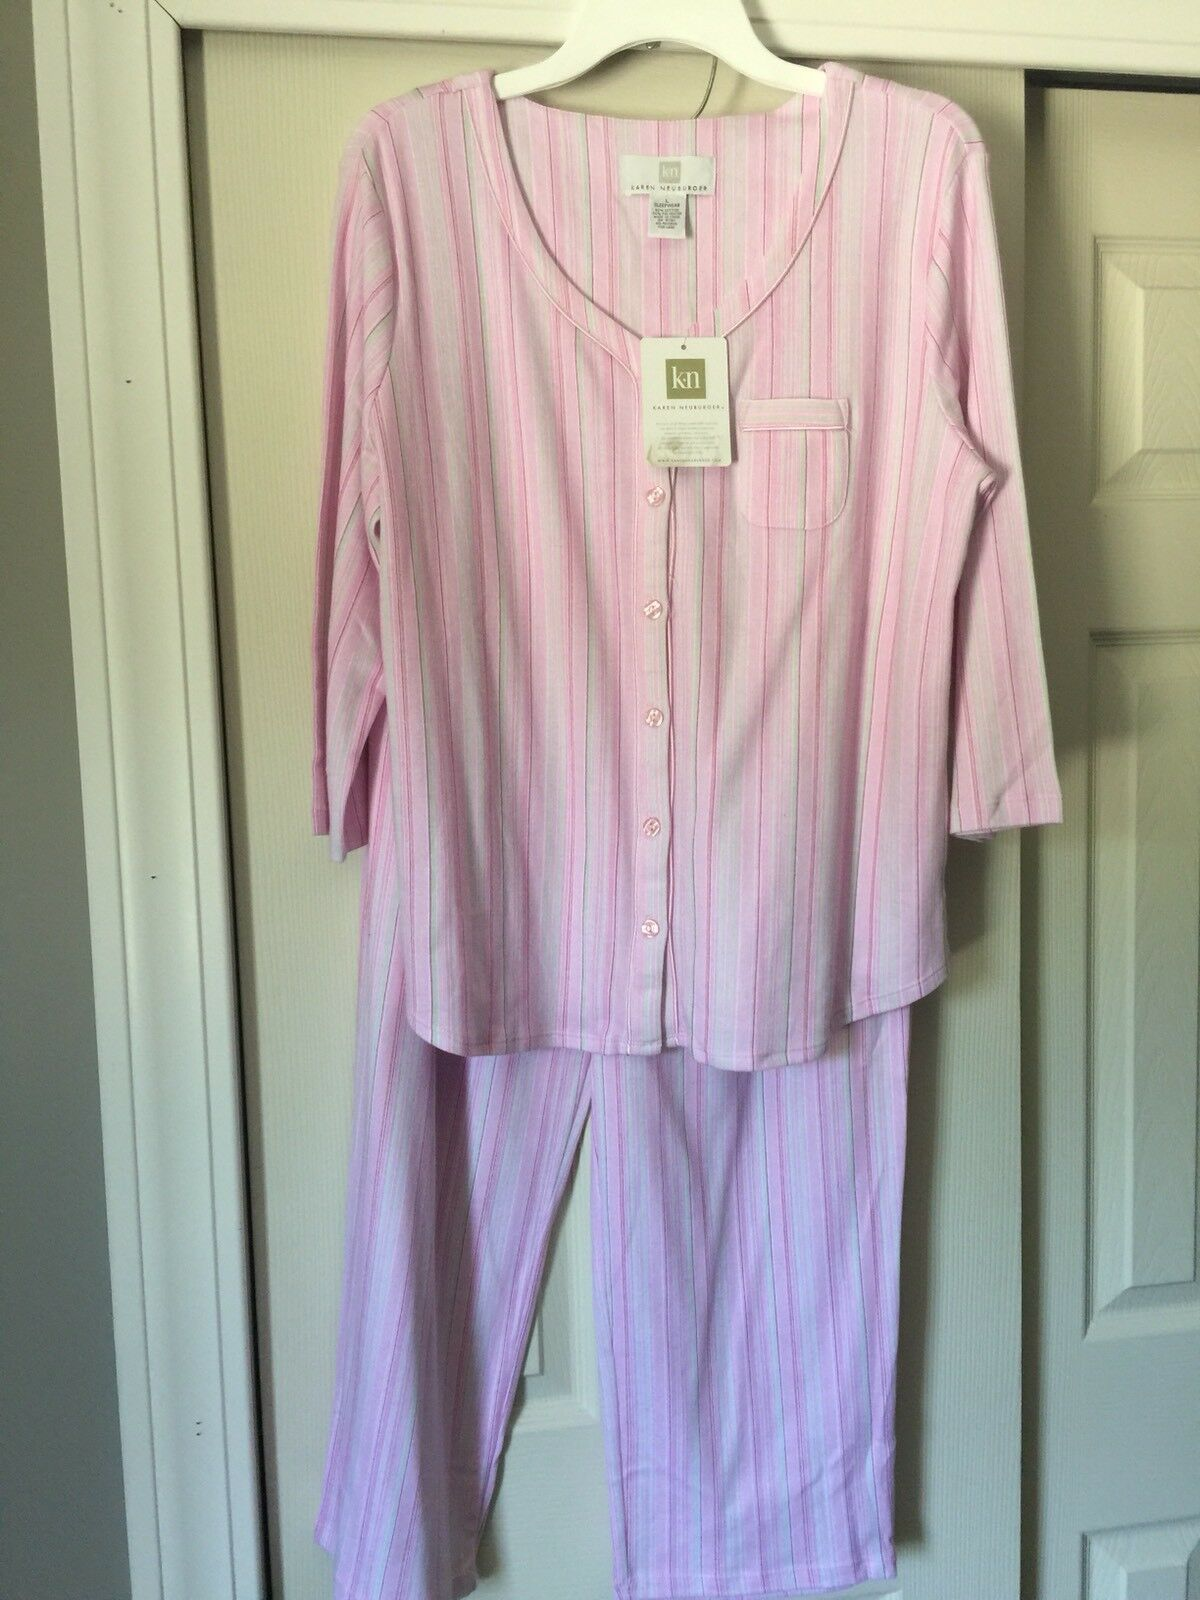 Karen Neuburger PJ Set 3 4 Sleeve LongPants SzLarge Pink,White & GreenStripe NWT